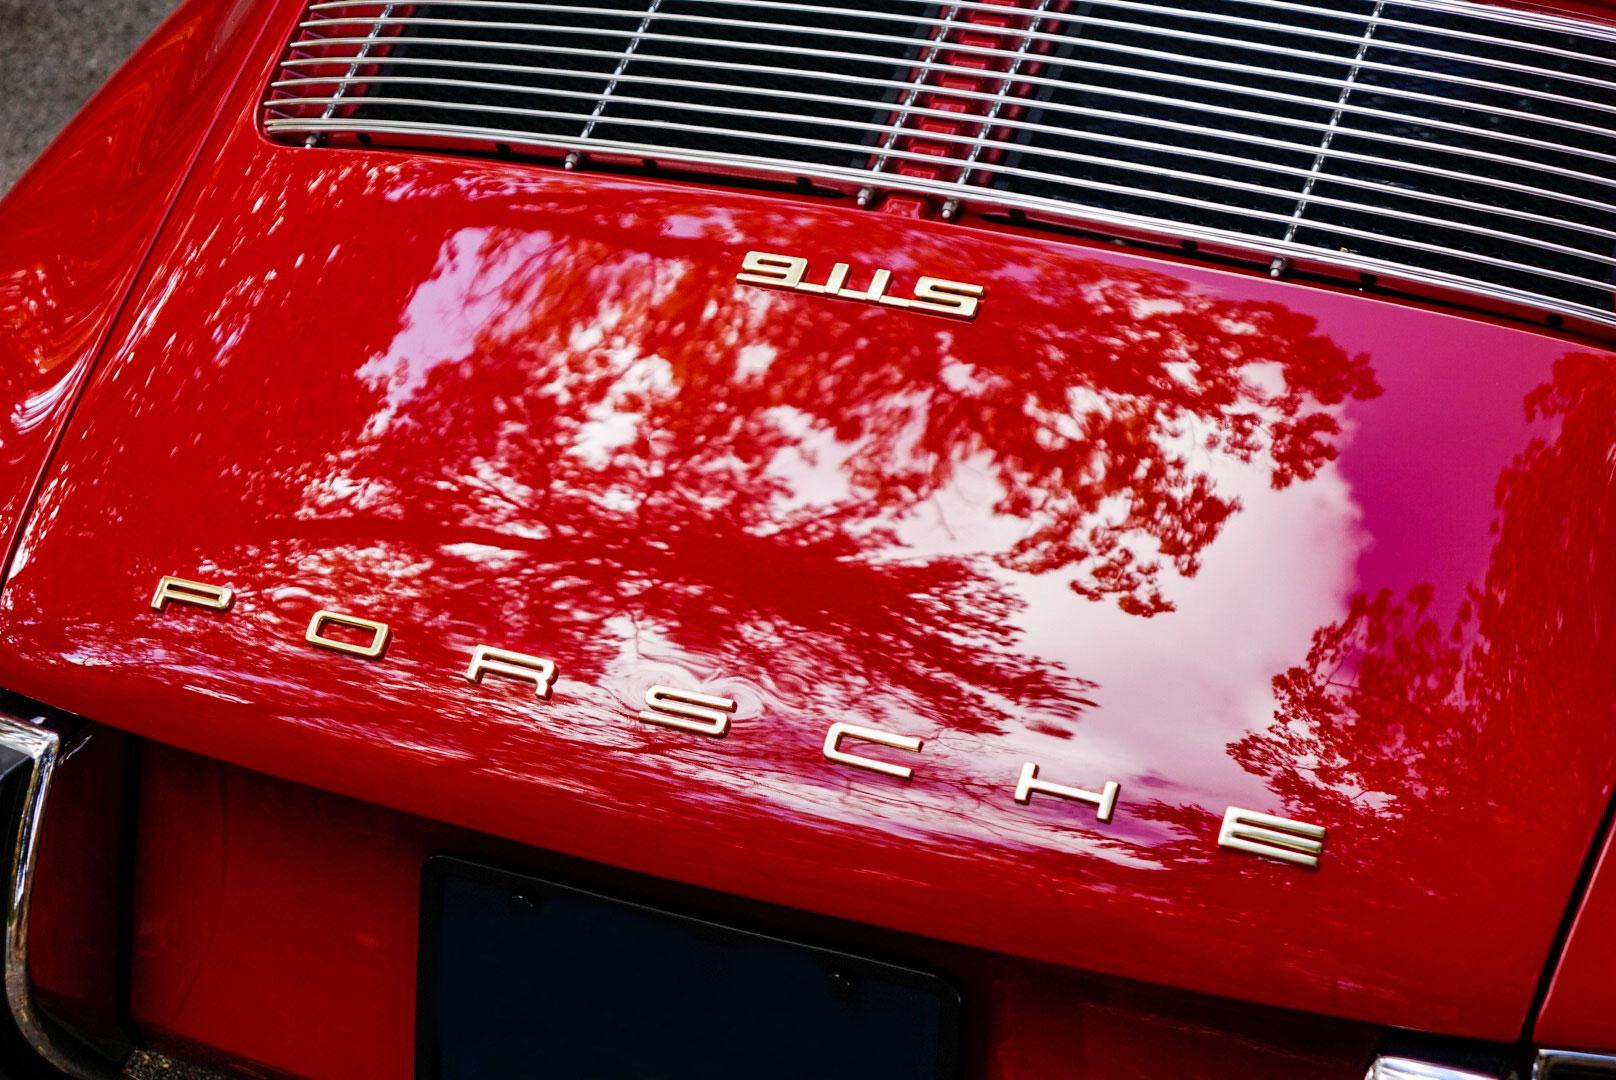 1967 Porsche 911S rear detail